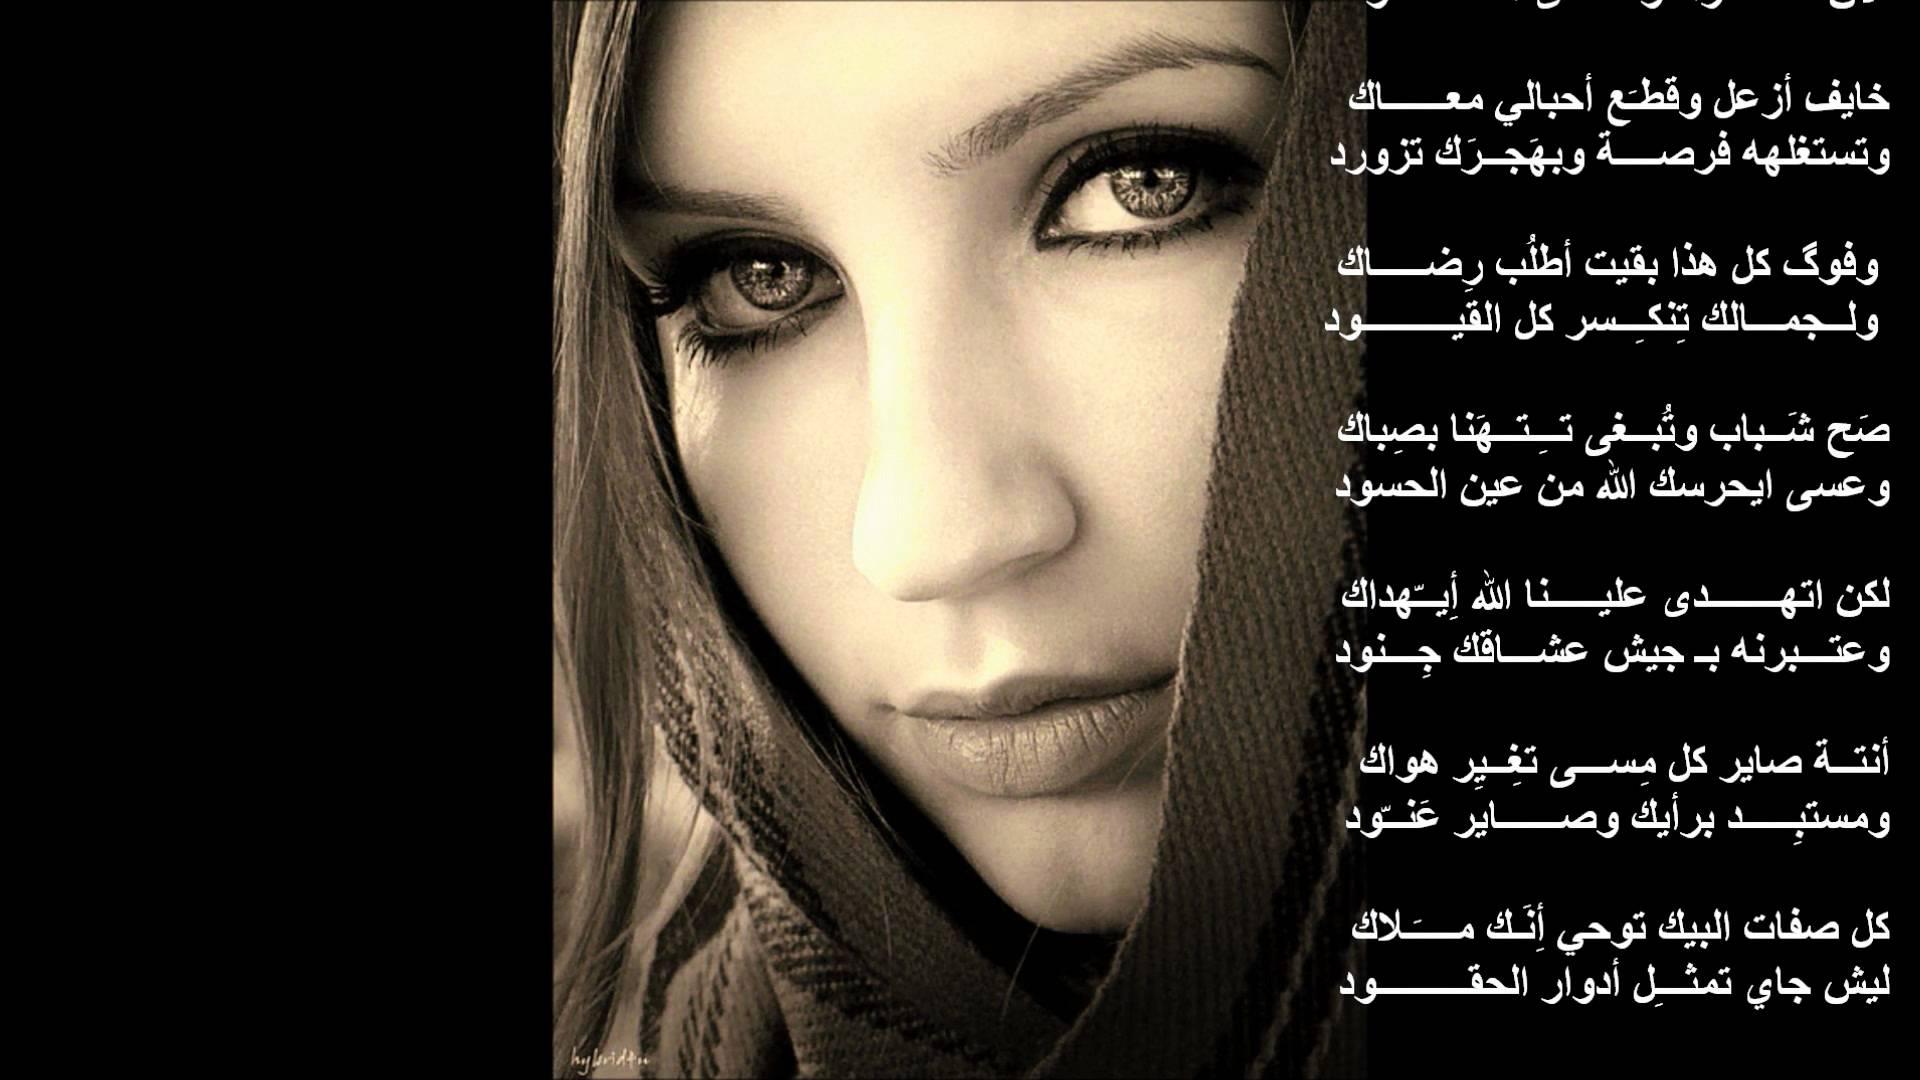 صور شعر غزل عراقي , اجمل شعر غزل عراقي